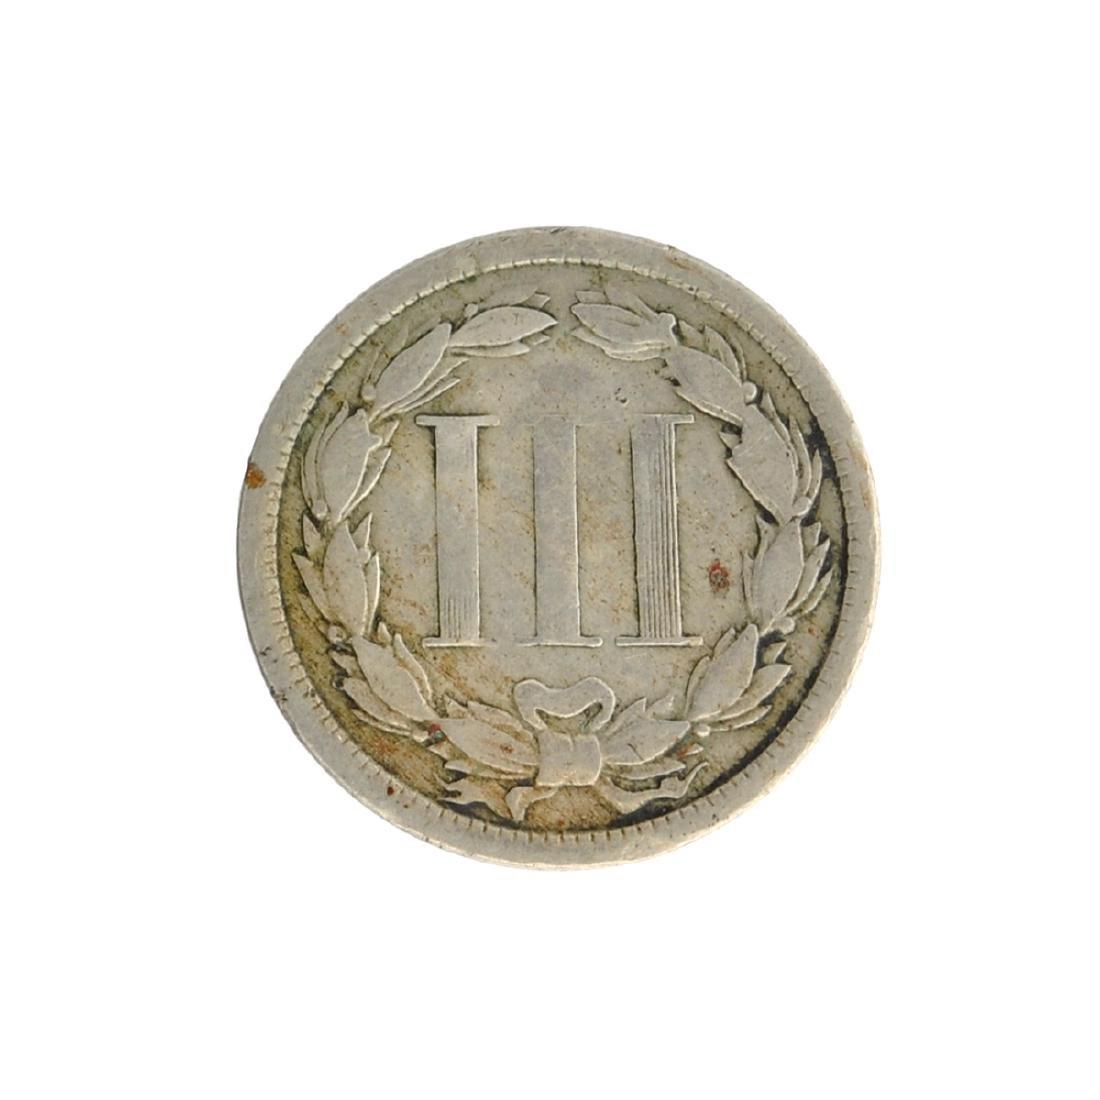 1865 Three-Cent Nickel Coin - 2